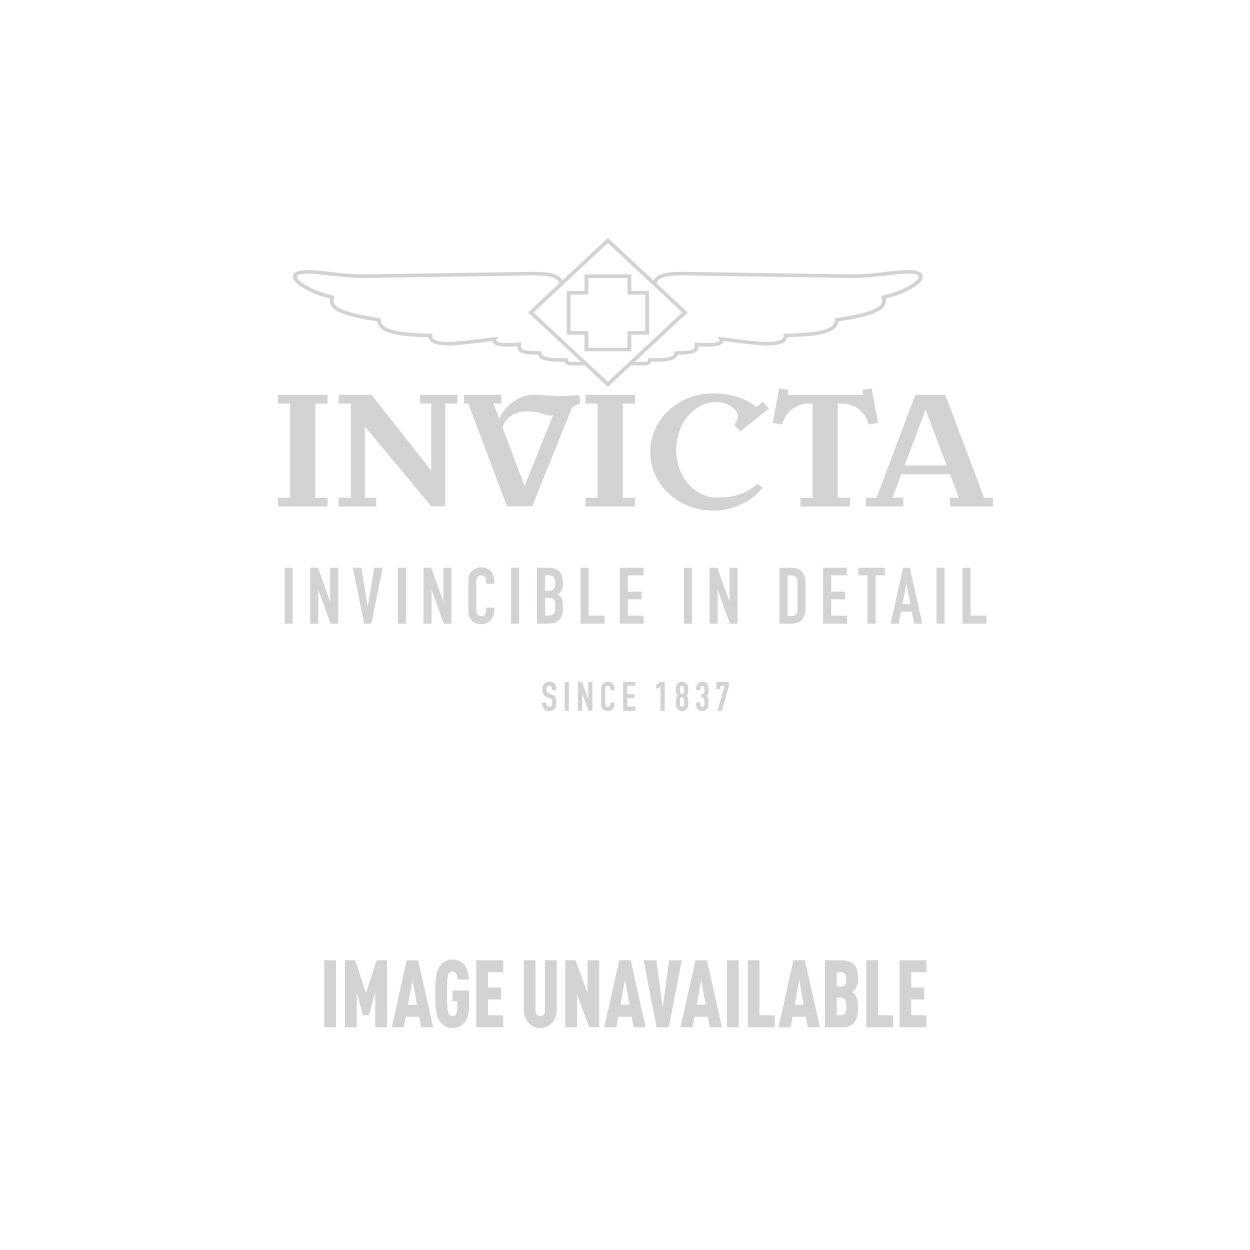 Invicta Corduba Swiss Movement Quartz Watch - Gold case with Gold, Black tone Stainless Steel, Polyurethane band - Model 1701